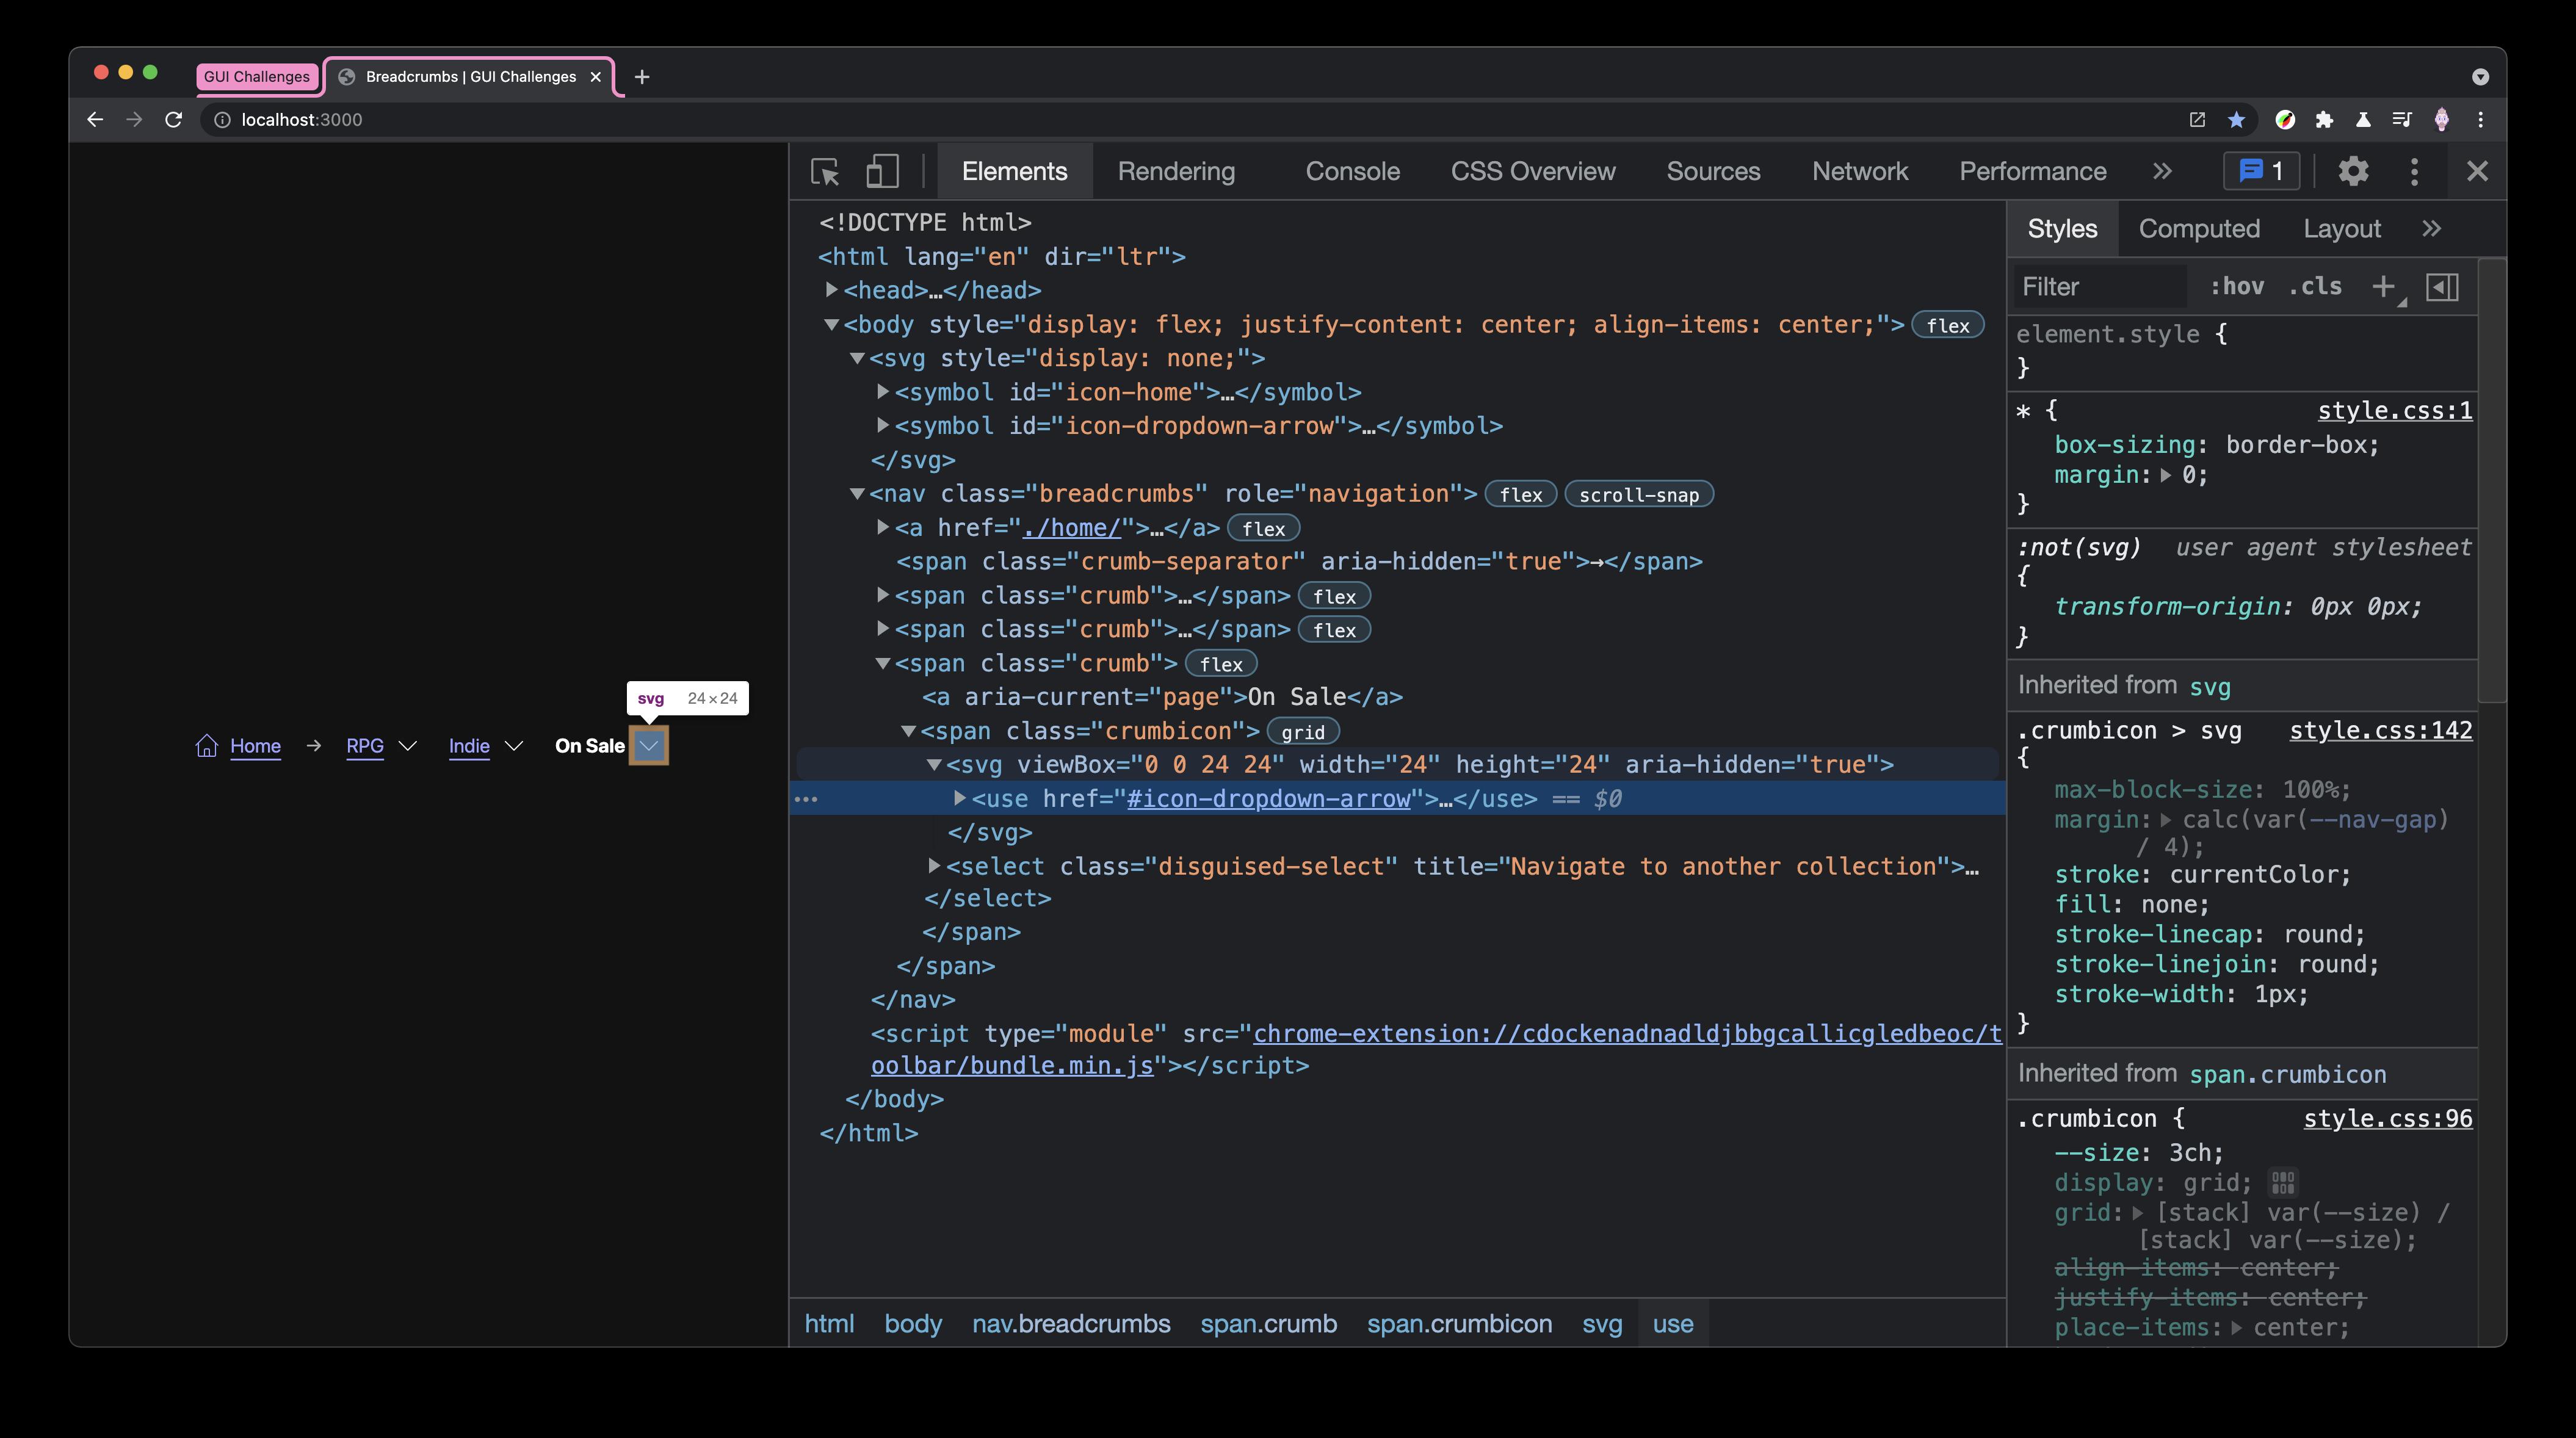 DevTools showing a rendered `<use>` SVG element.